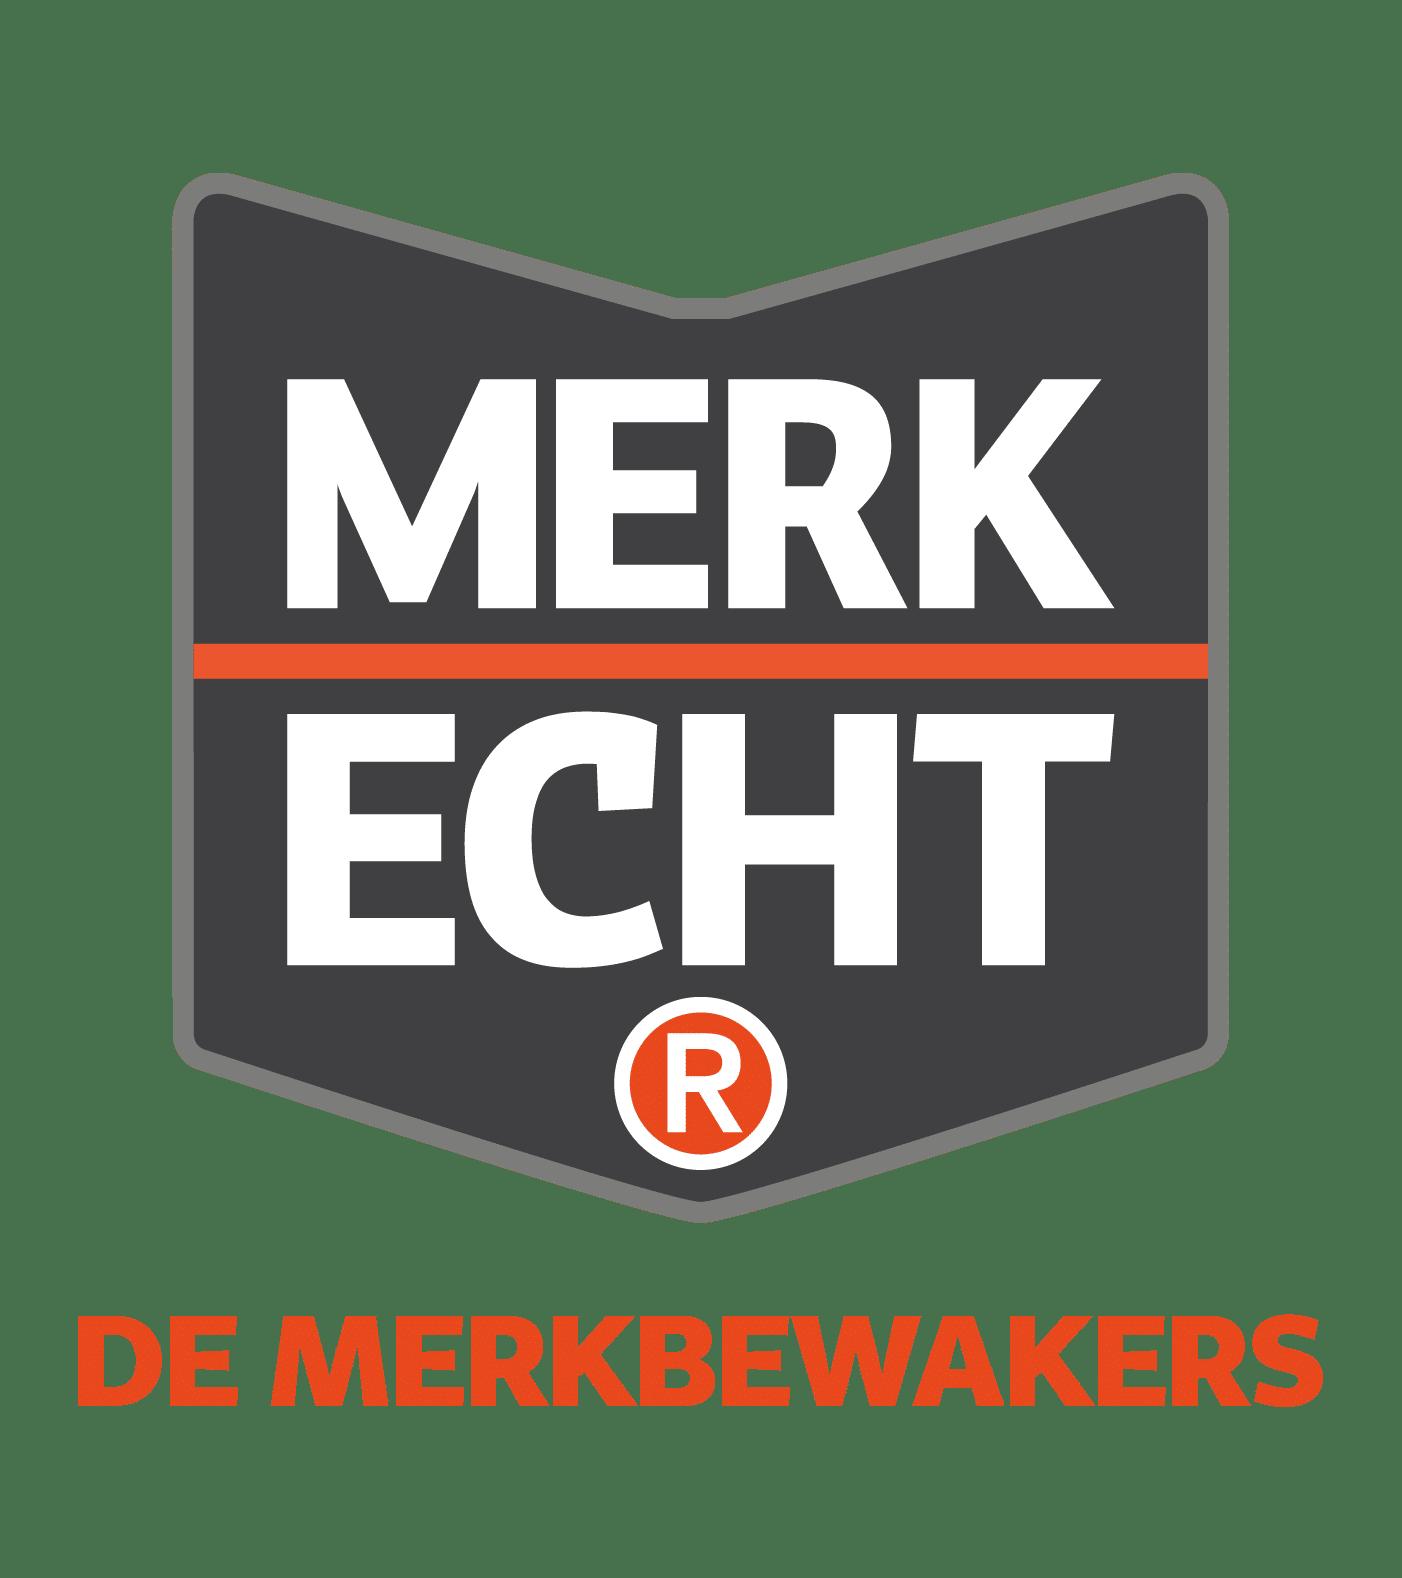 logo-merk-echt-de-merkbewakers